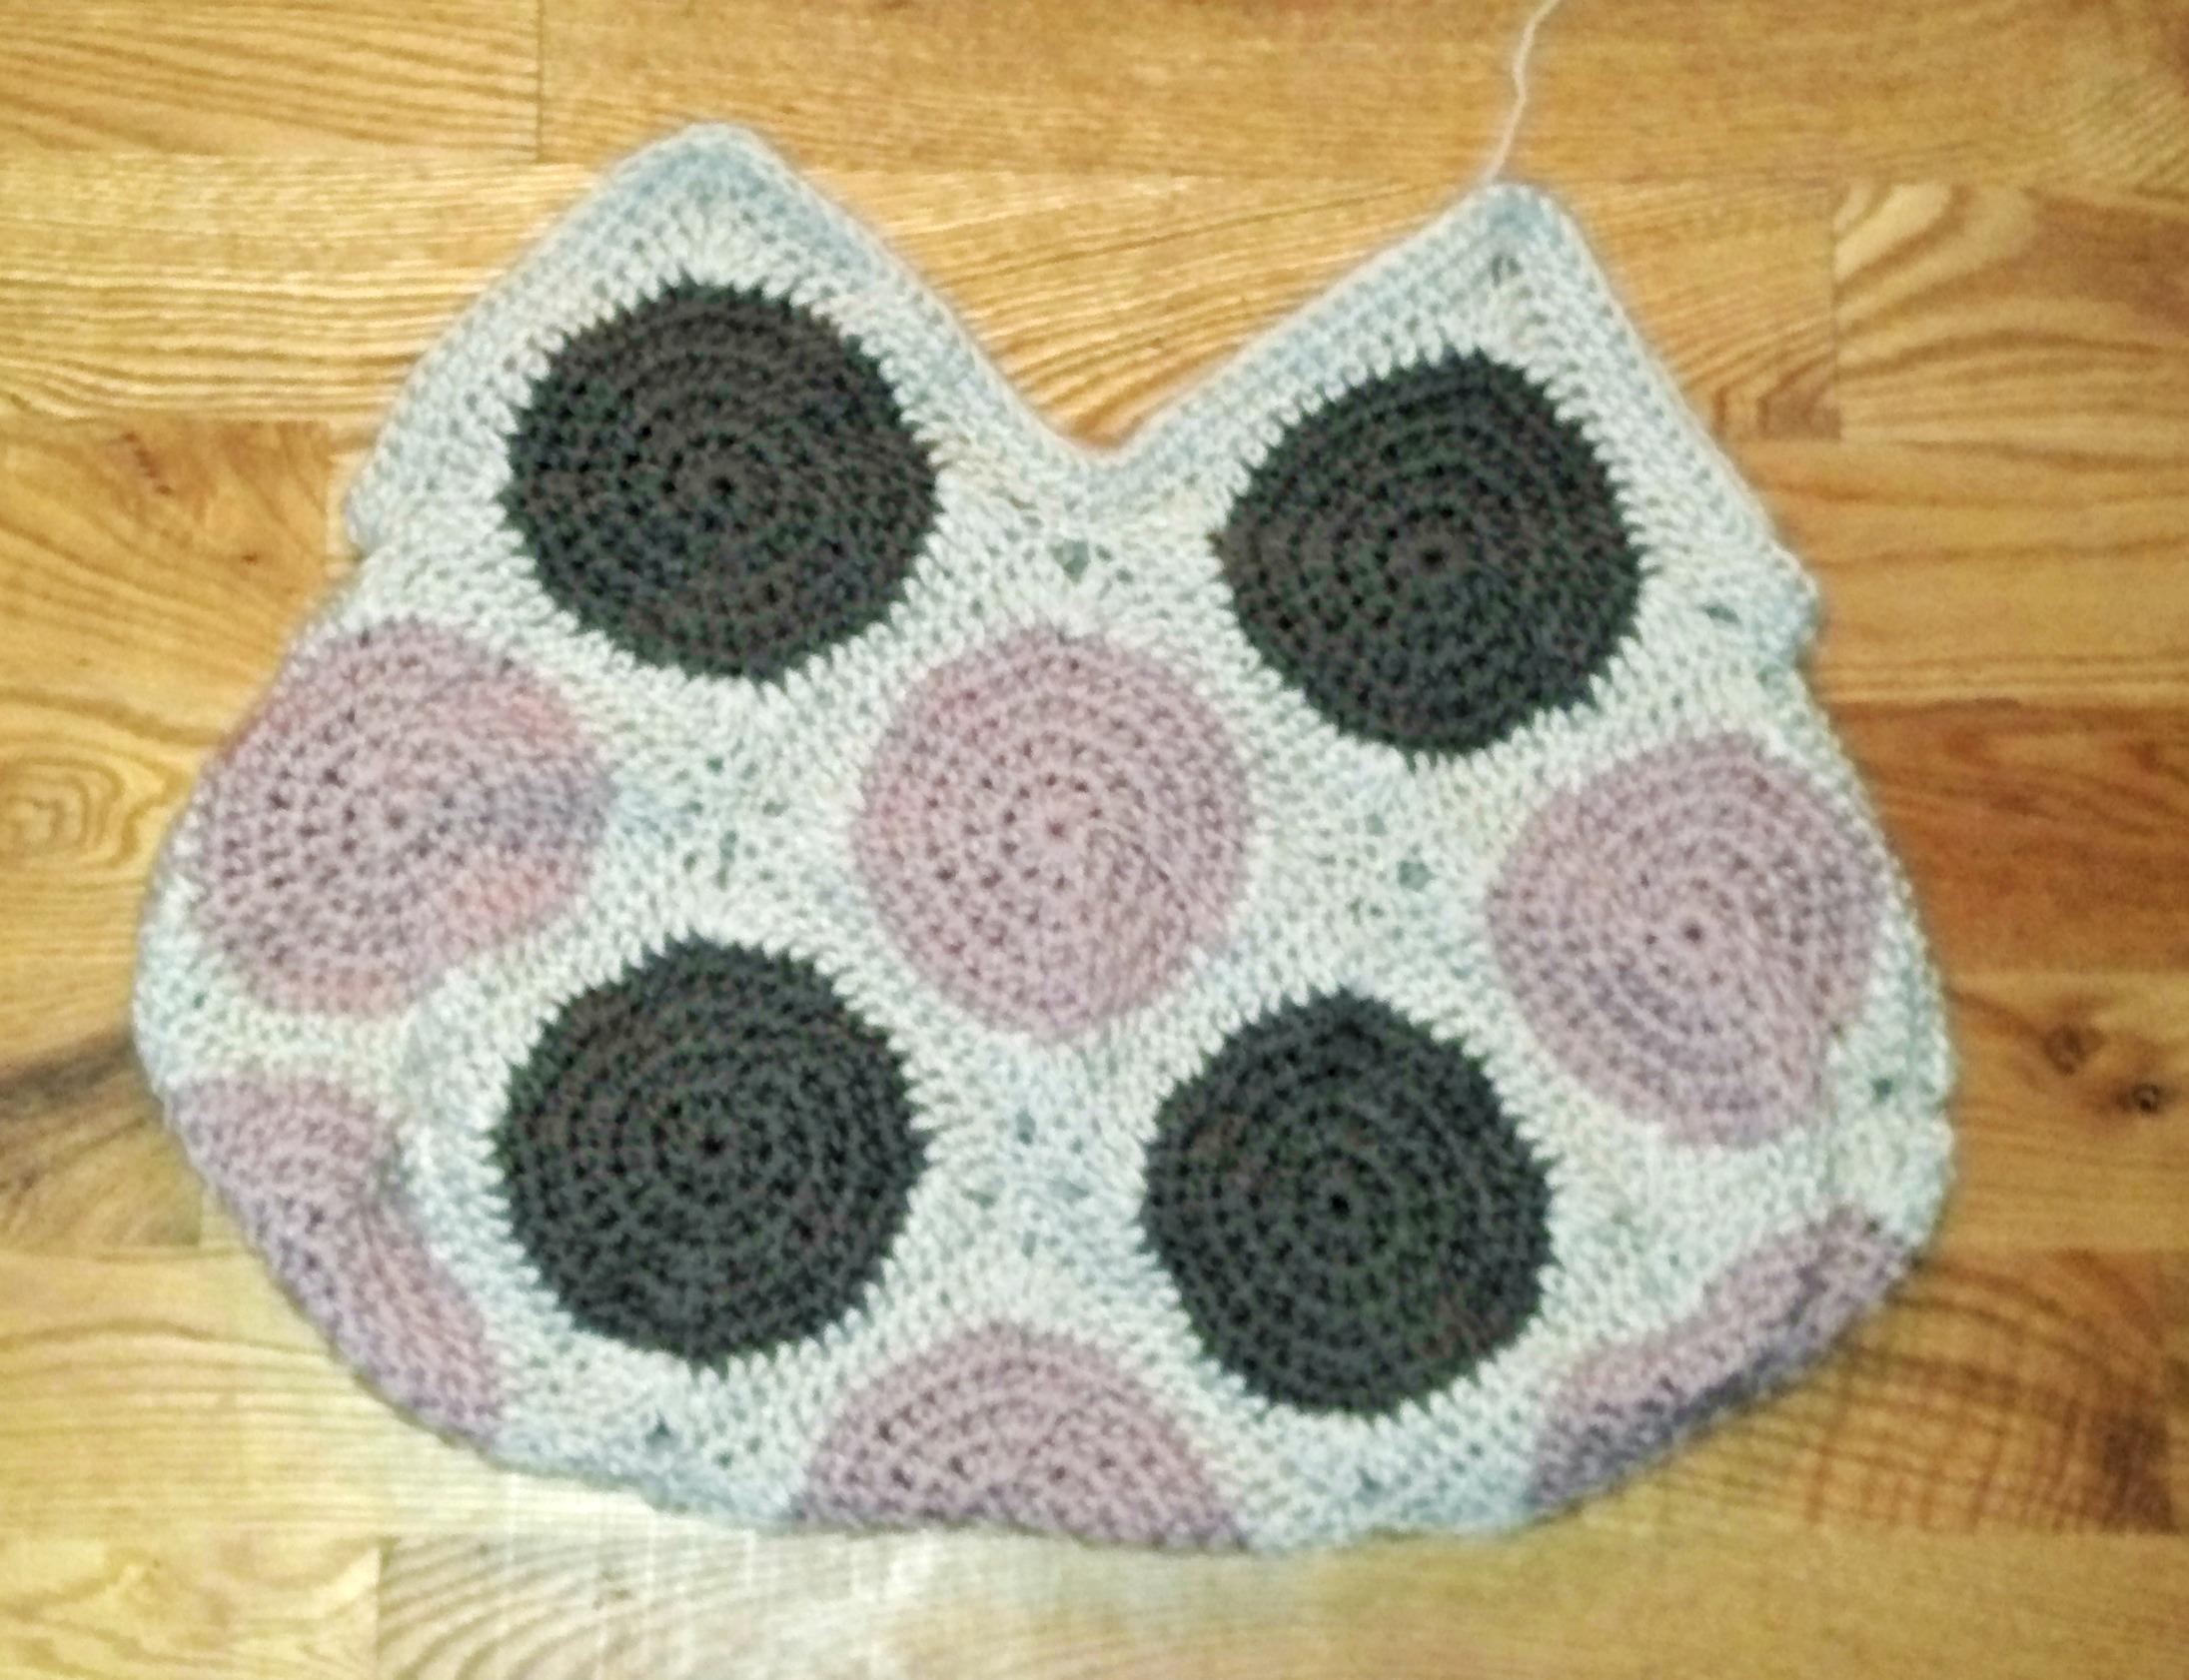 Crochet Granny Square Hobo Bag Pattern : Circles into squares, and then a hobo bag. tolmema